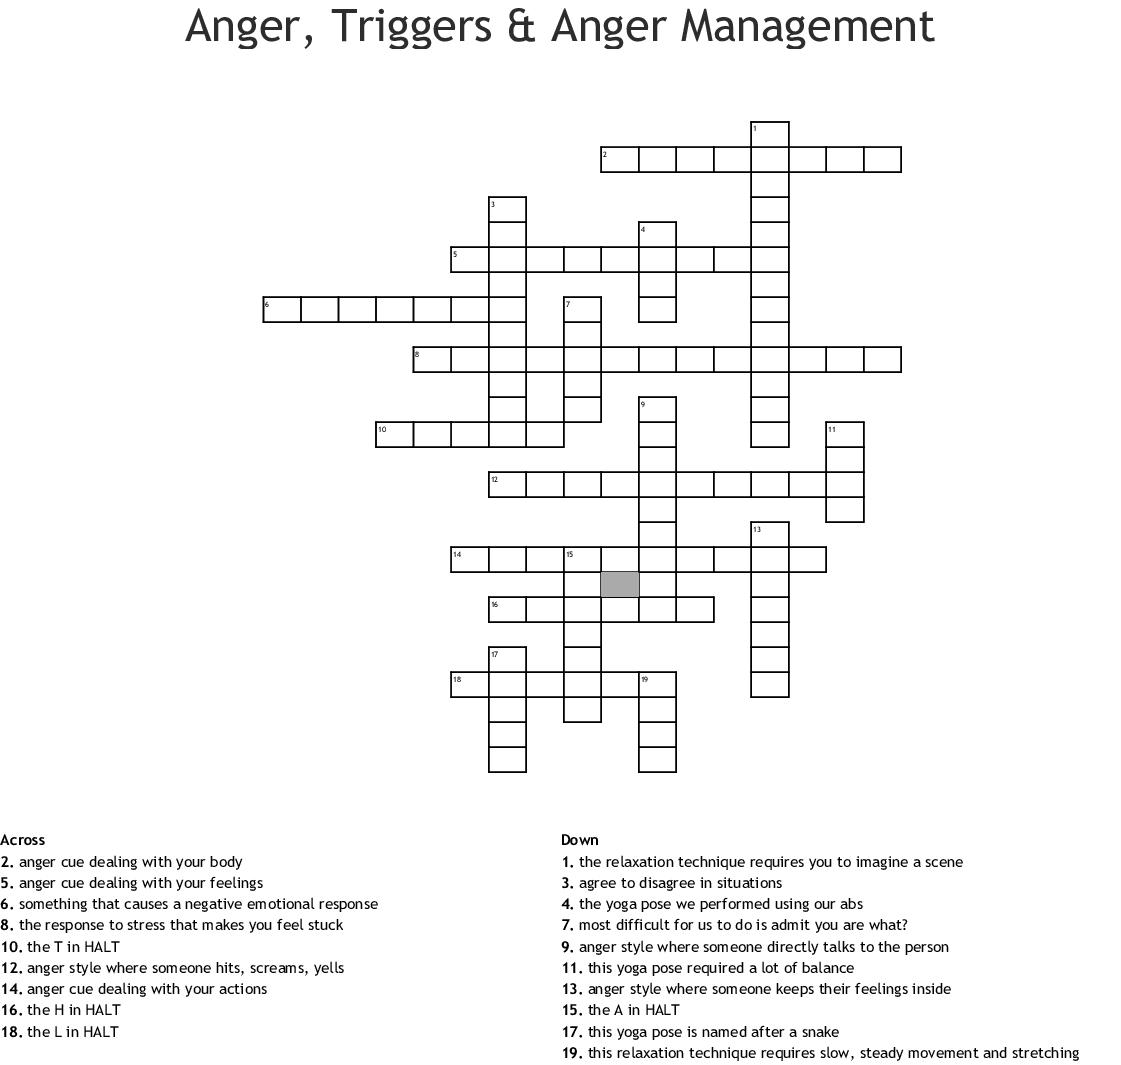 Anger Management Word Scramble